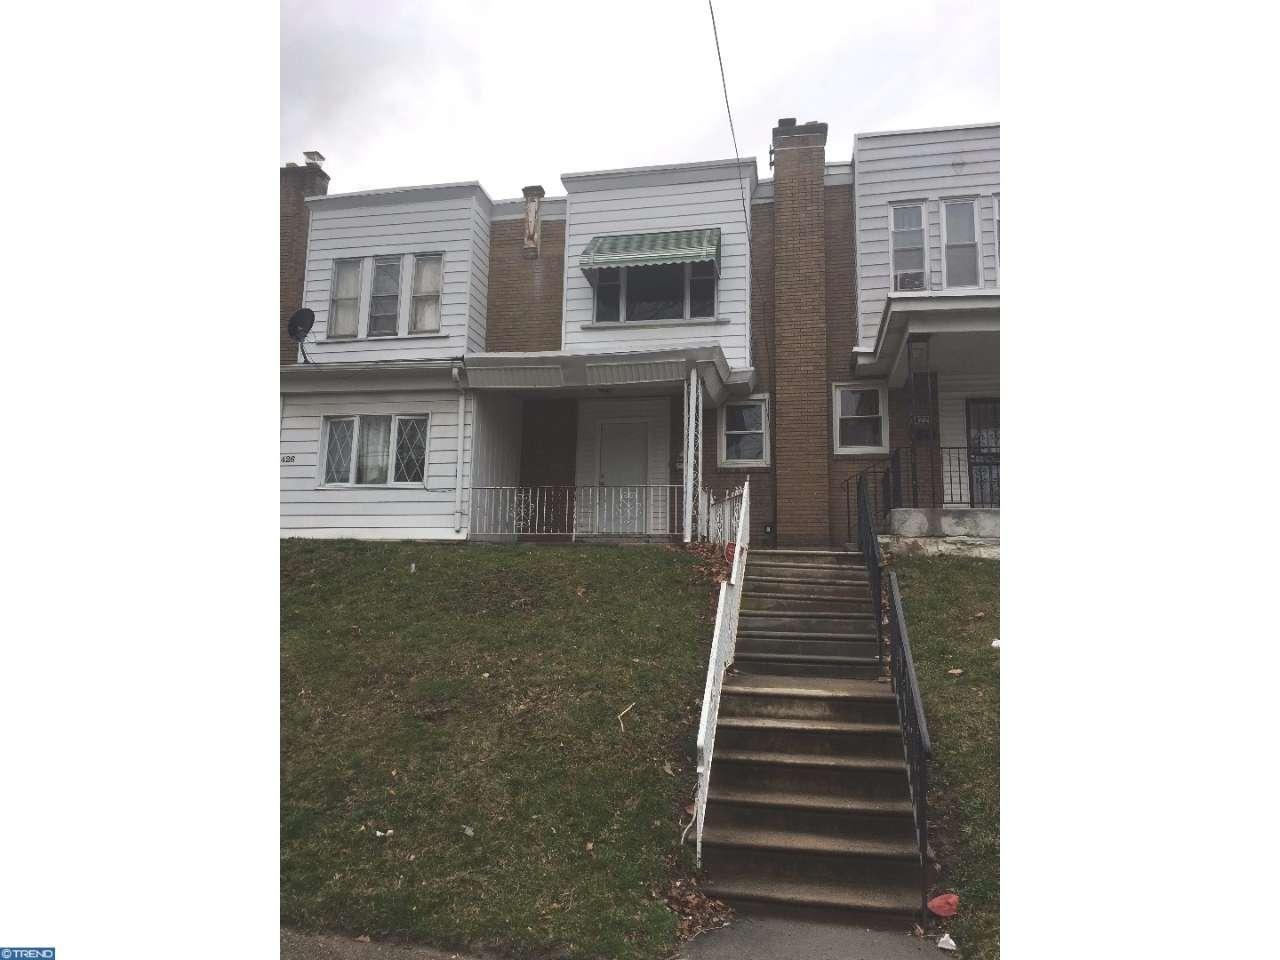 424 S 2nd St, Darby, PA 19023